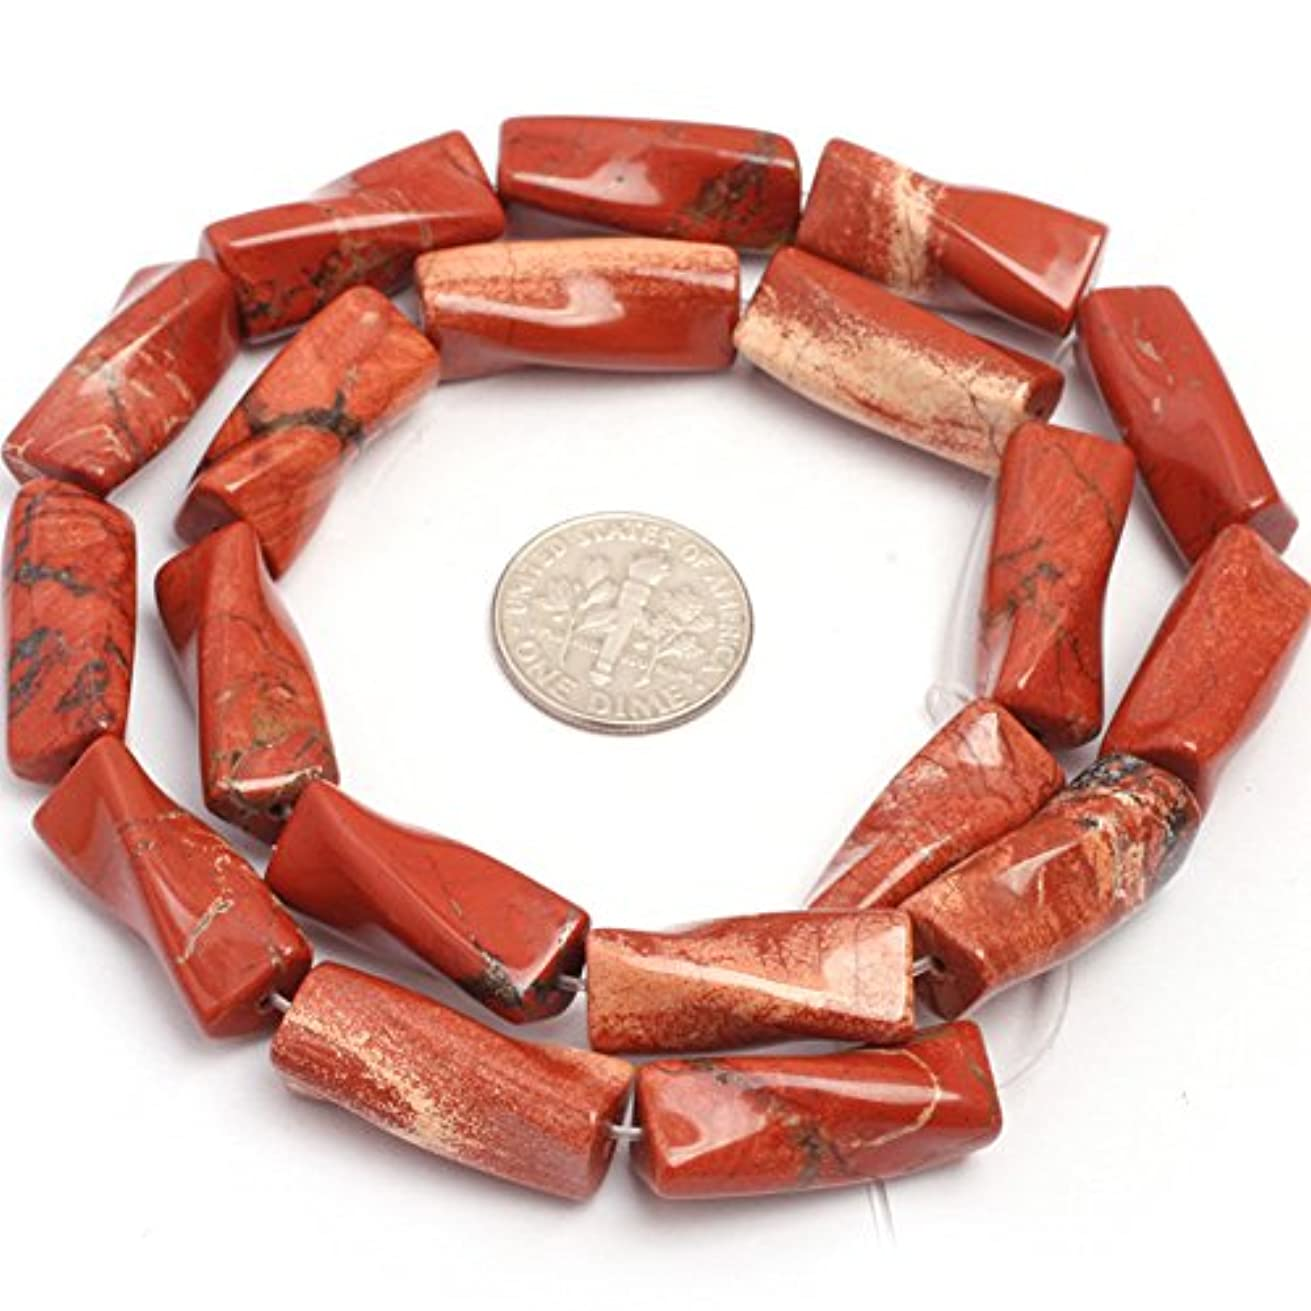 JOE FOREMAN 9x20mm Red Jasper Semi Precious Gemstone Twist Column Loose Beads for Jewelry Making DIY Handmade Craft Supplies 15